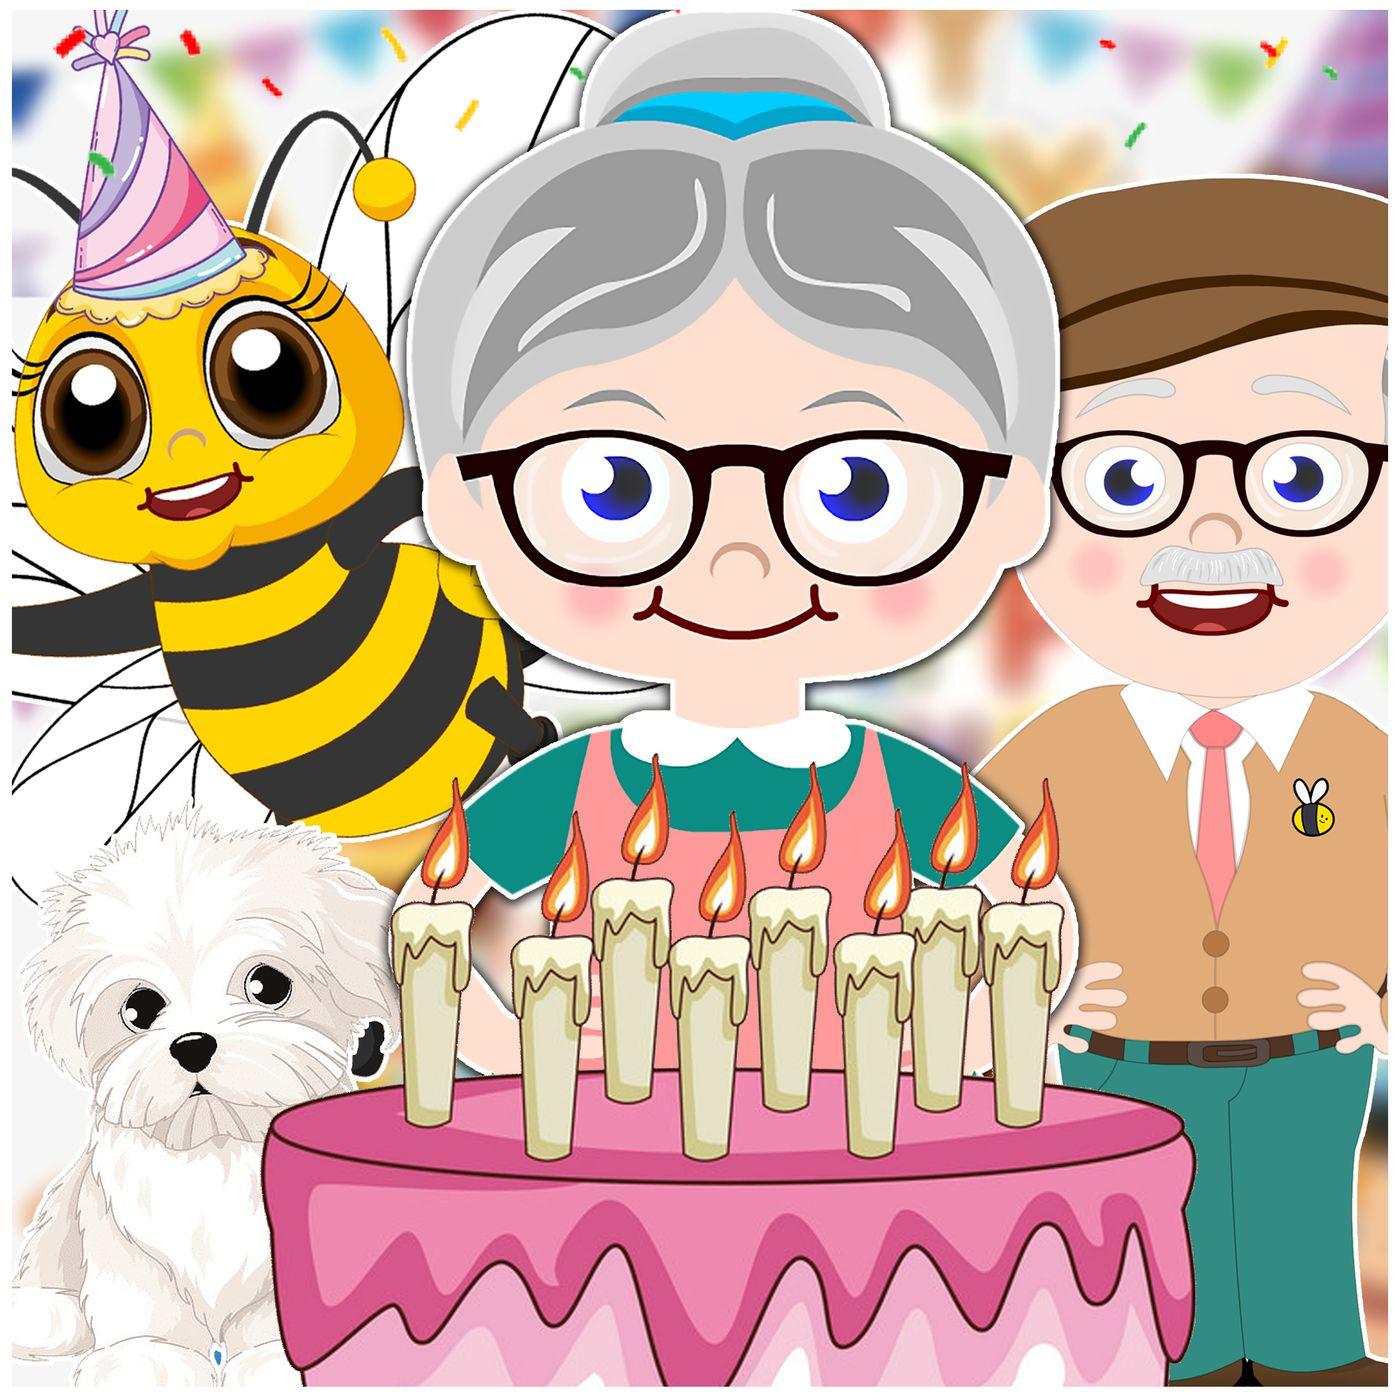 Mrs. Honeybee's Birthday - Bedtime Story